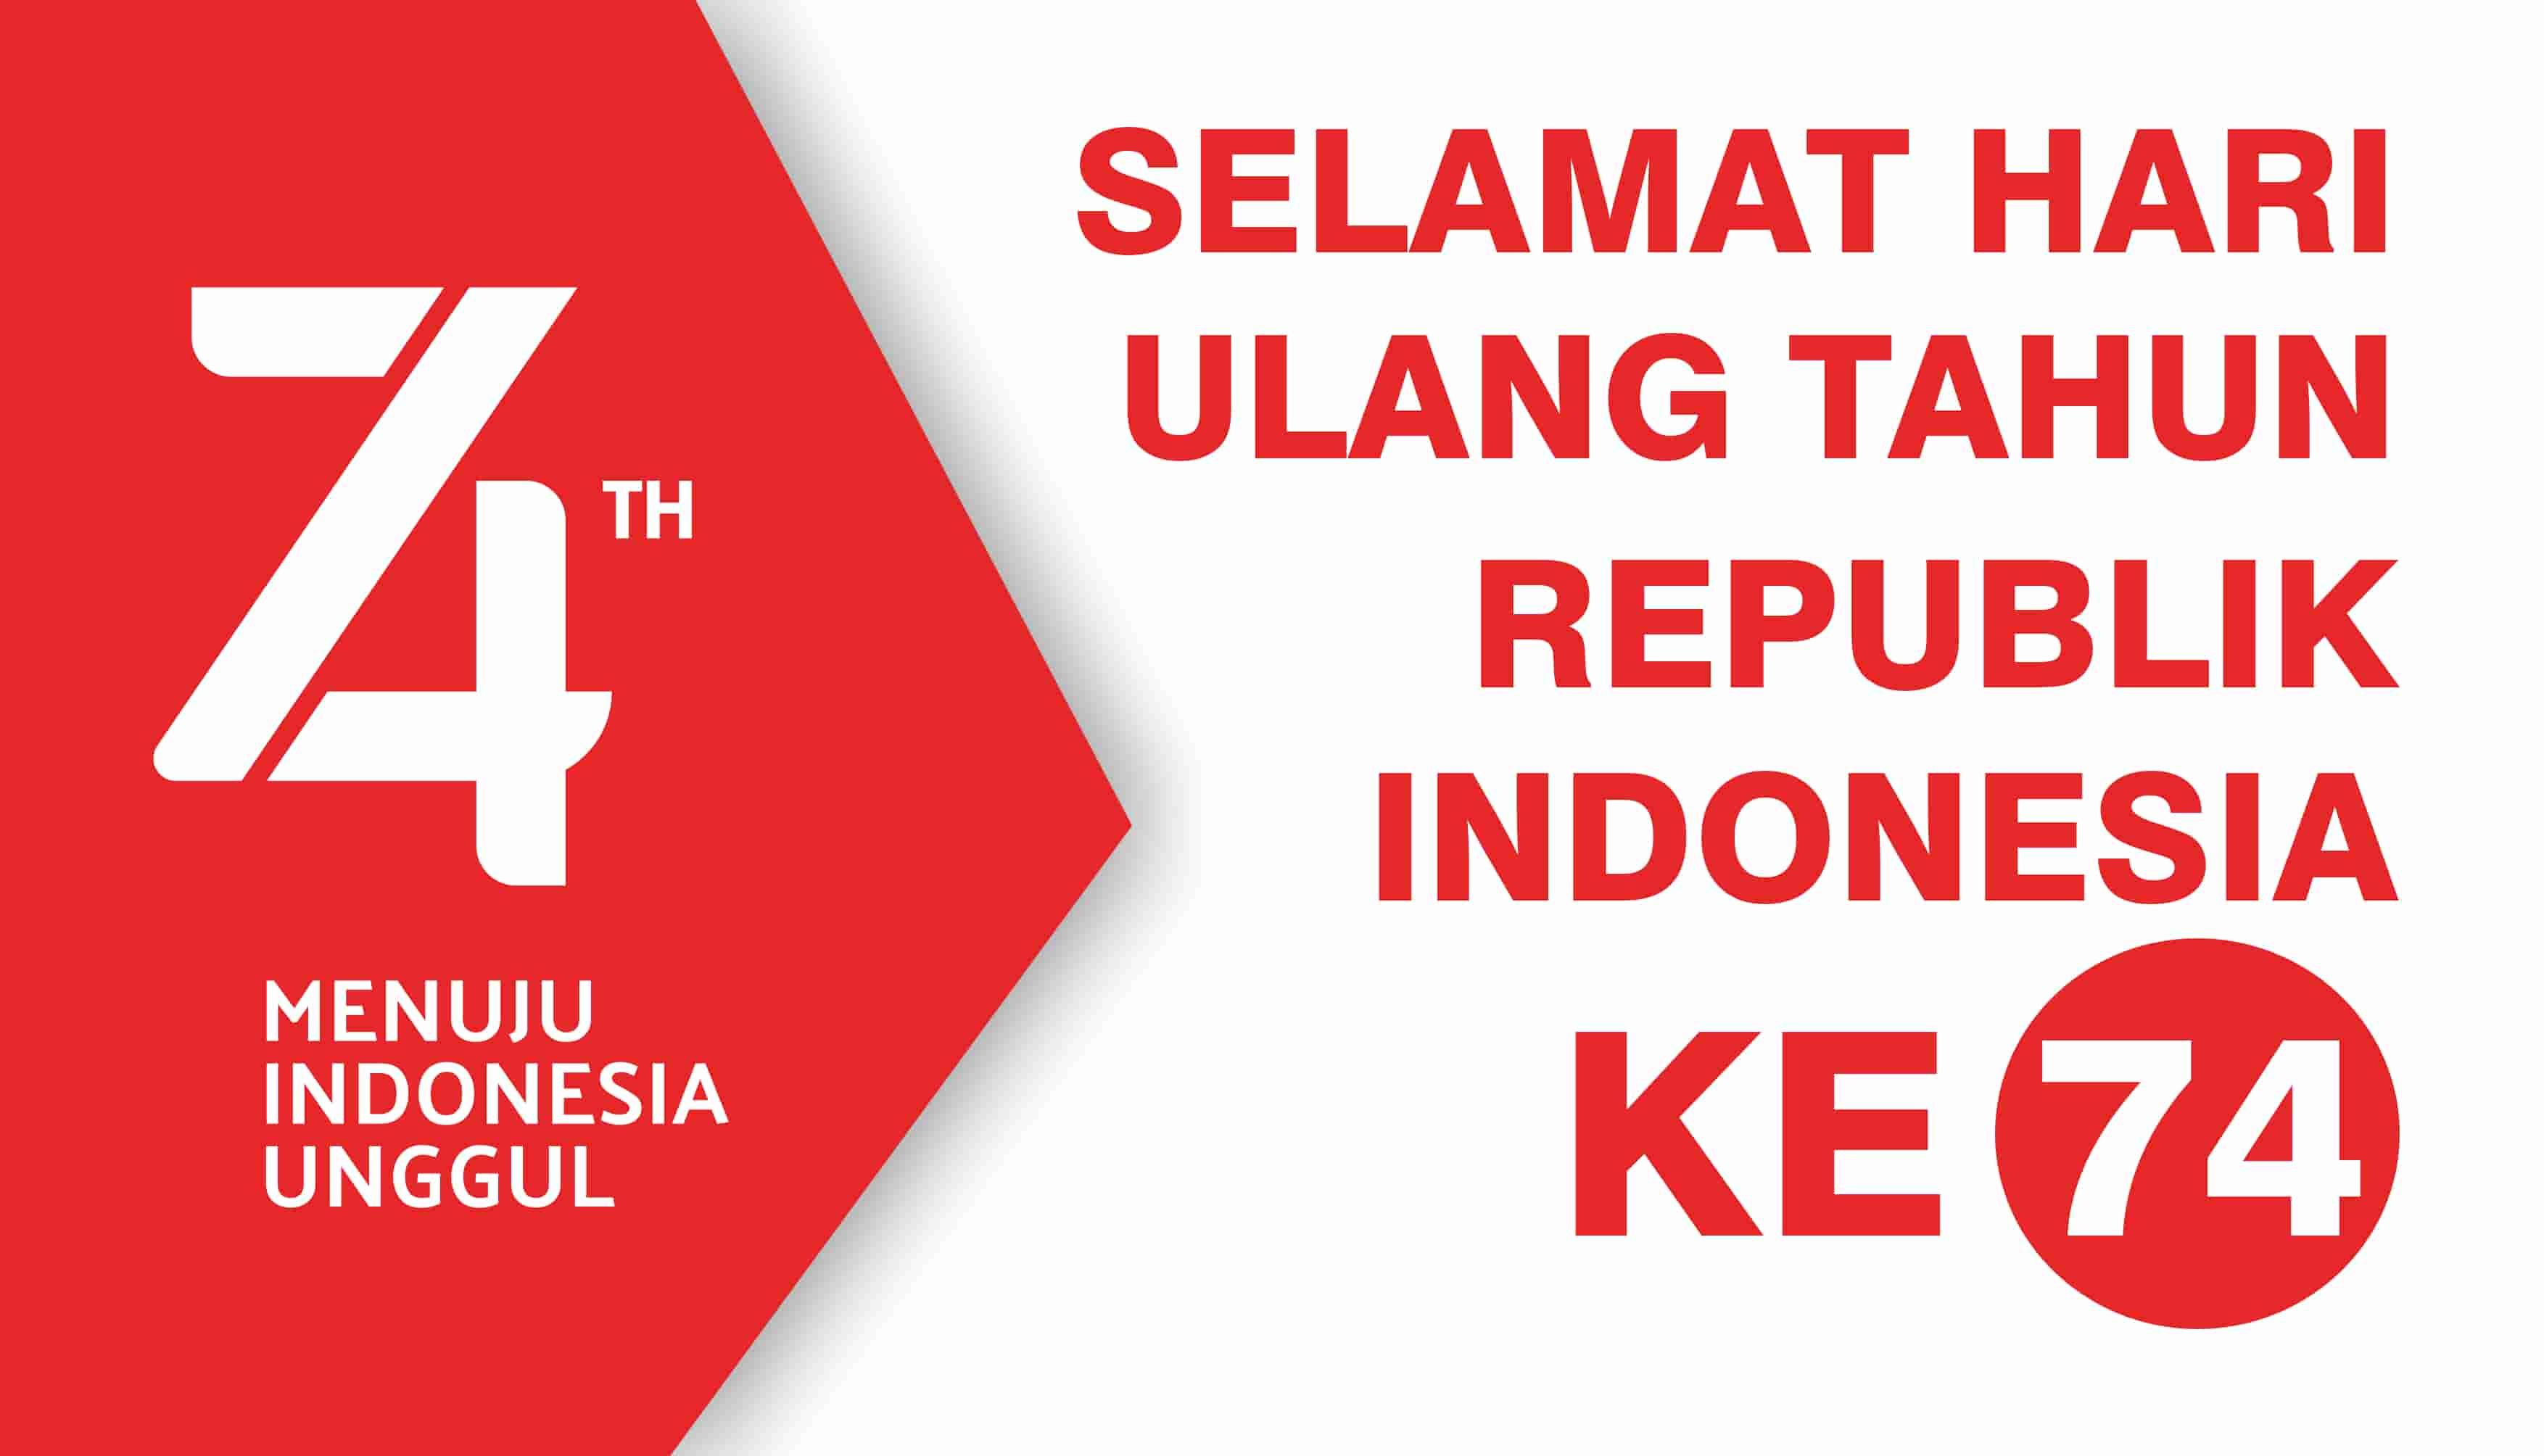 Ucapan Hari Kemerdekaan Indonesia ke 74 (17 Agustus 2019)